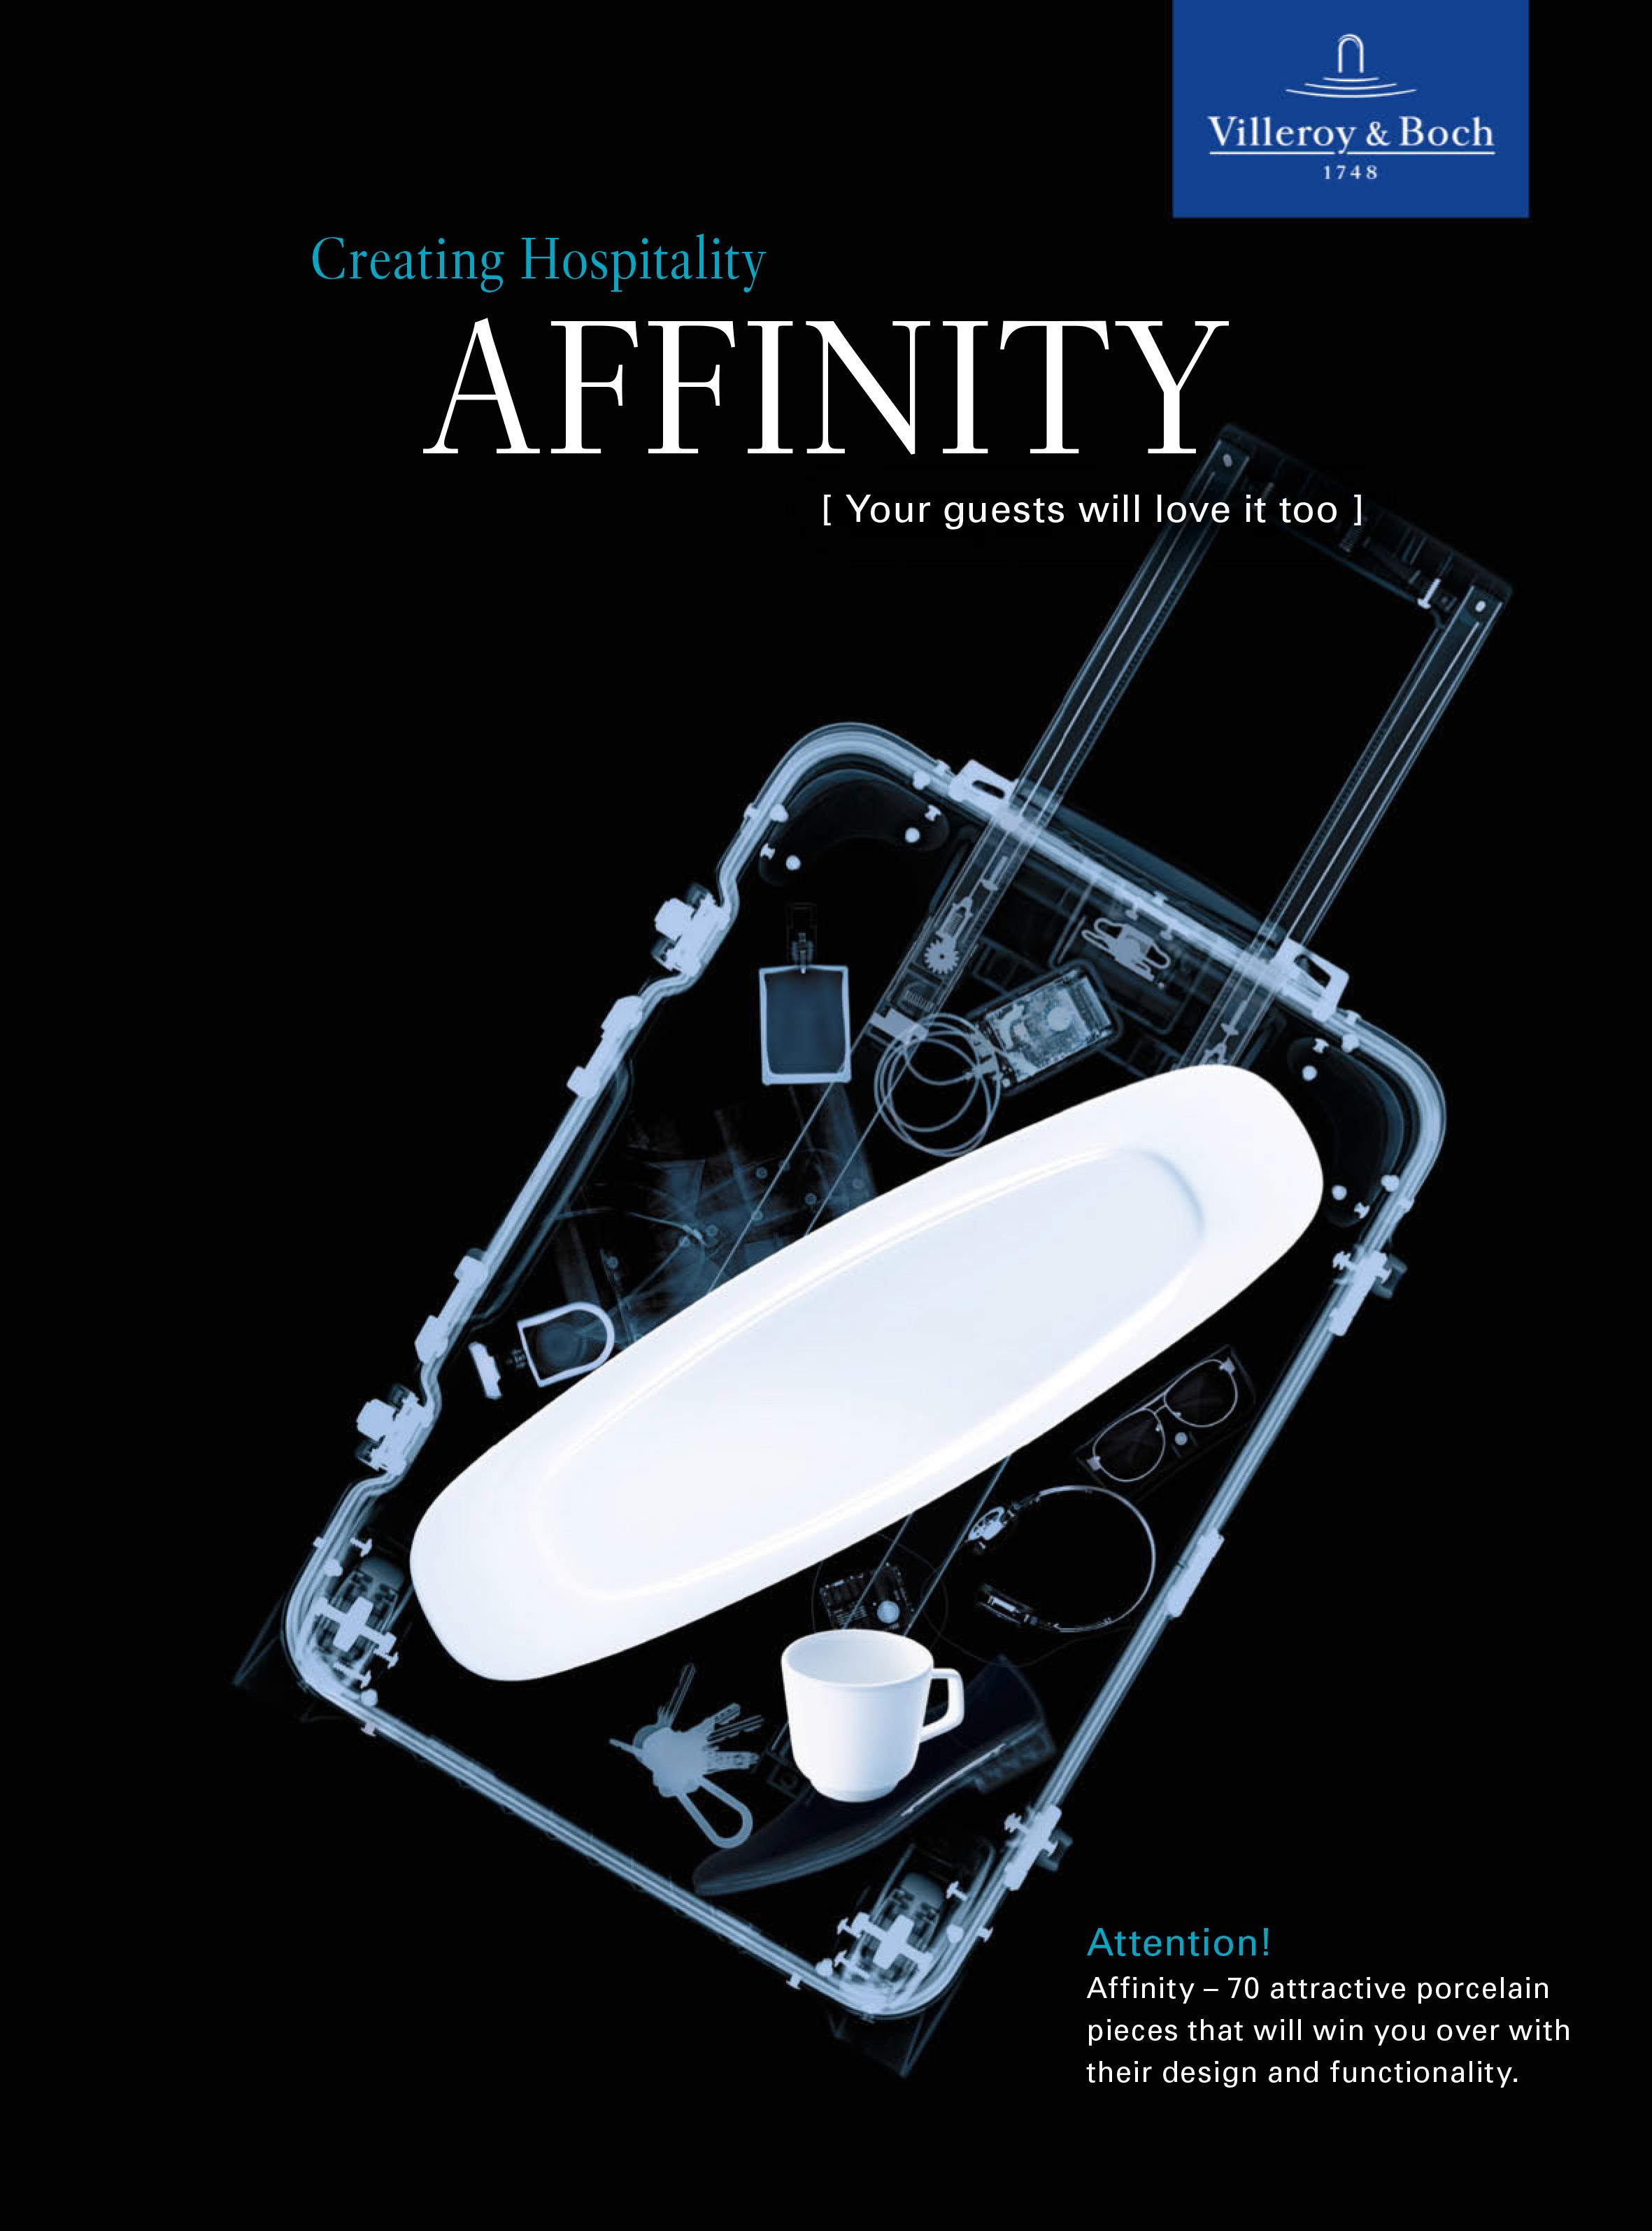 01-Affinity_29-9703-6002